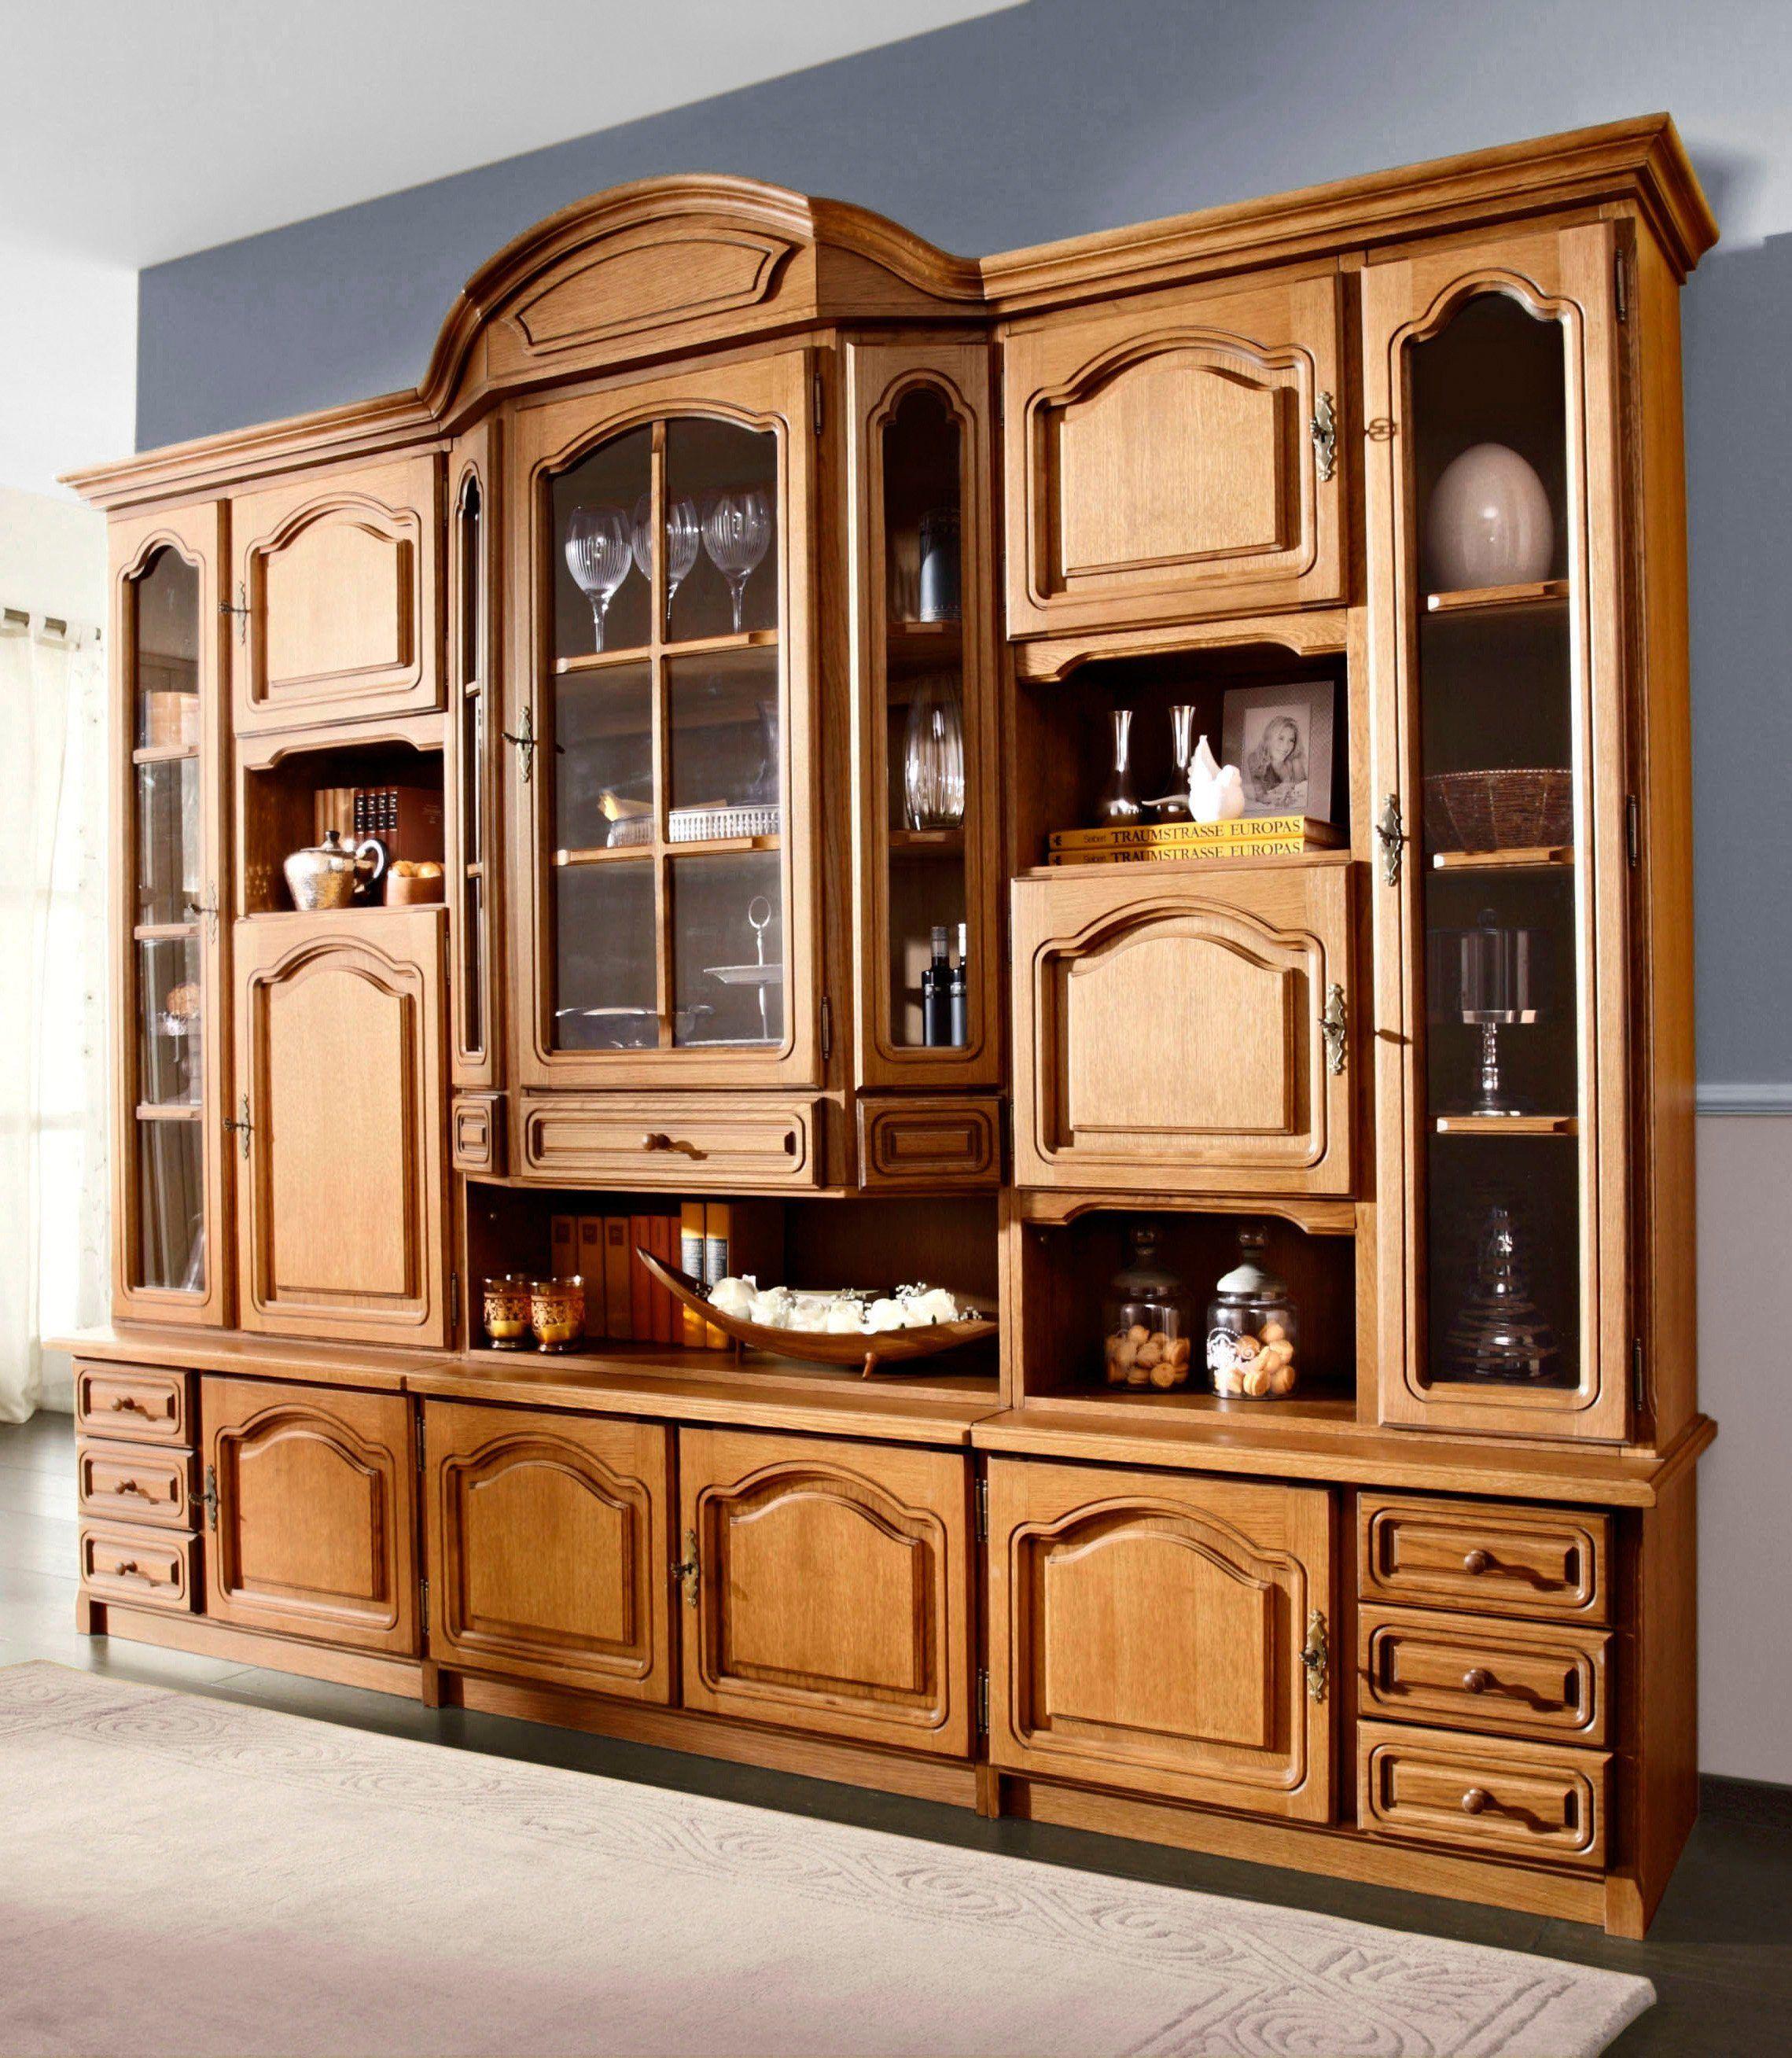 wohnwand braun holz stunning weiss holz rheumri wohnzimmer dekoo with wohnwand braun holz. Black Bedroom Furniture Sets. Home Design Ideas